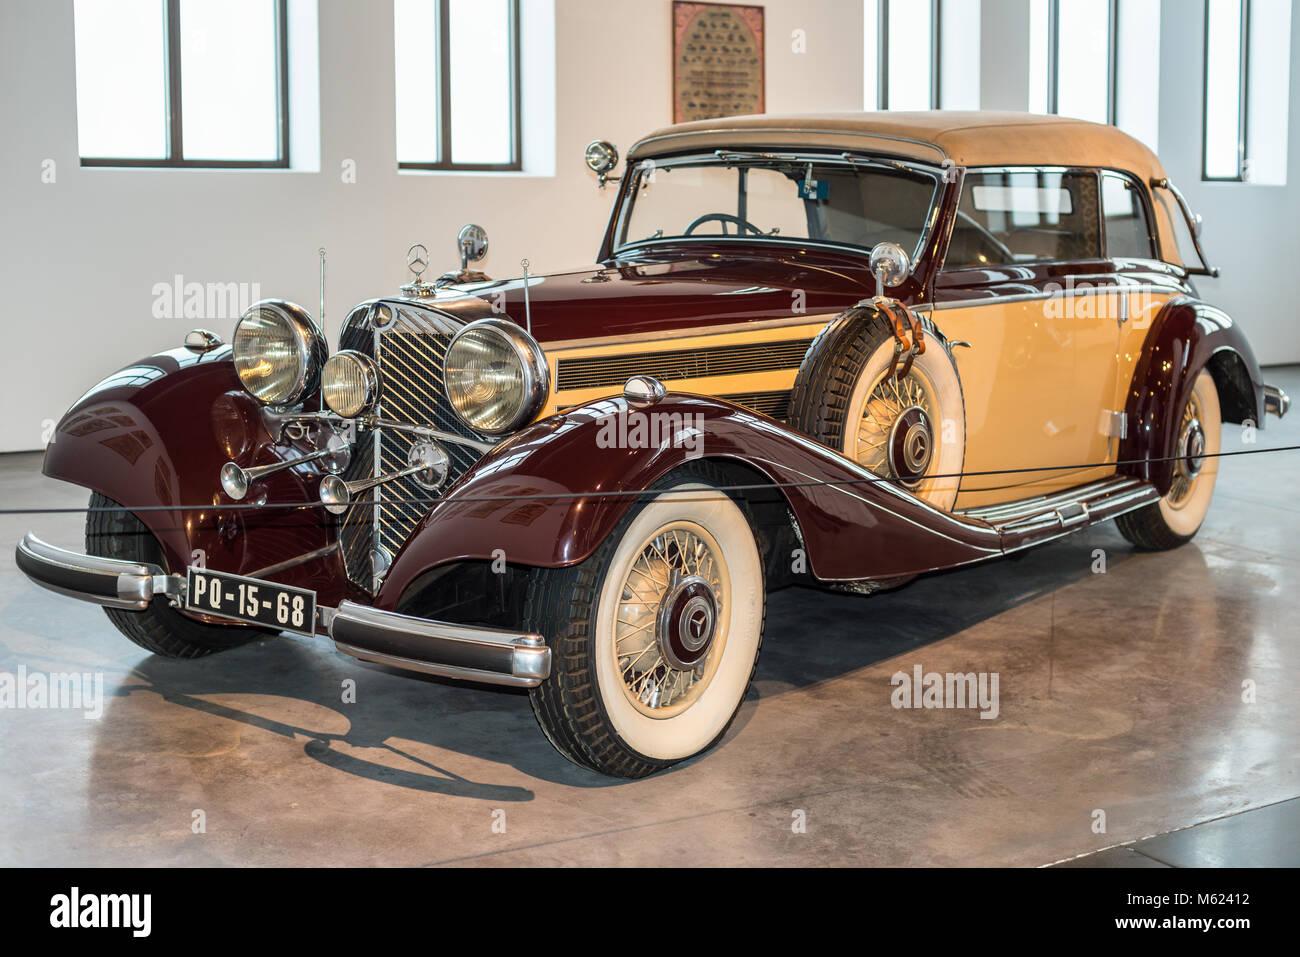 Malaga, Spain - December 7, 2016: Vintage Mercedes-Benz 540K (model 1937) Germany car displayed at Malaga Automobile - Stock Image